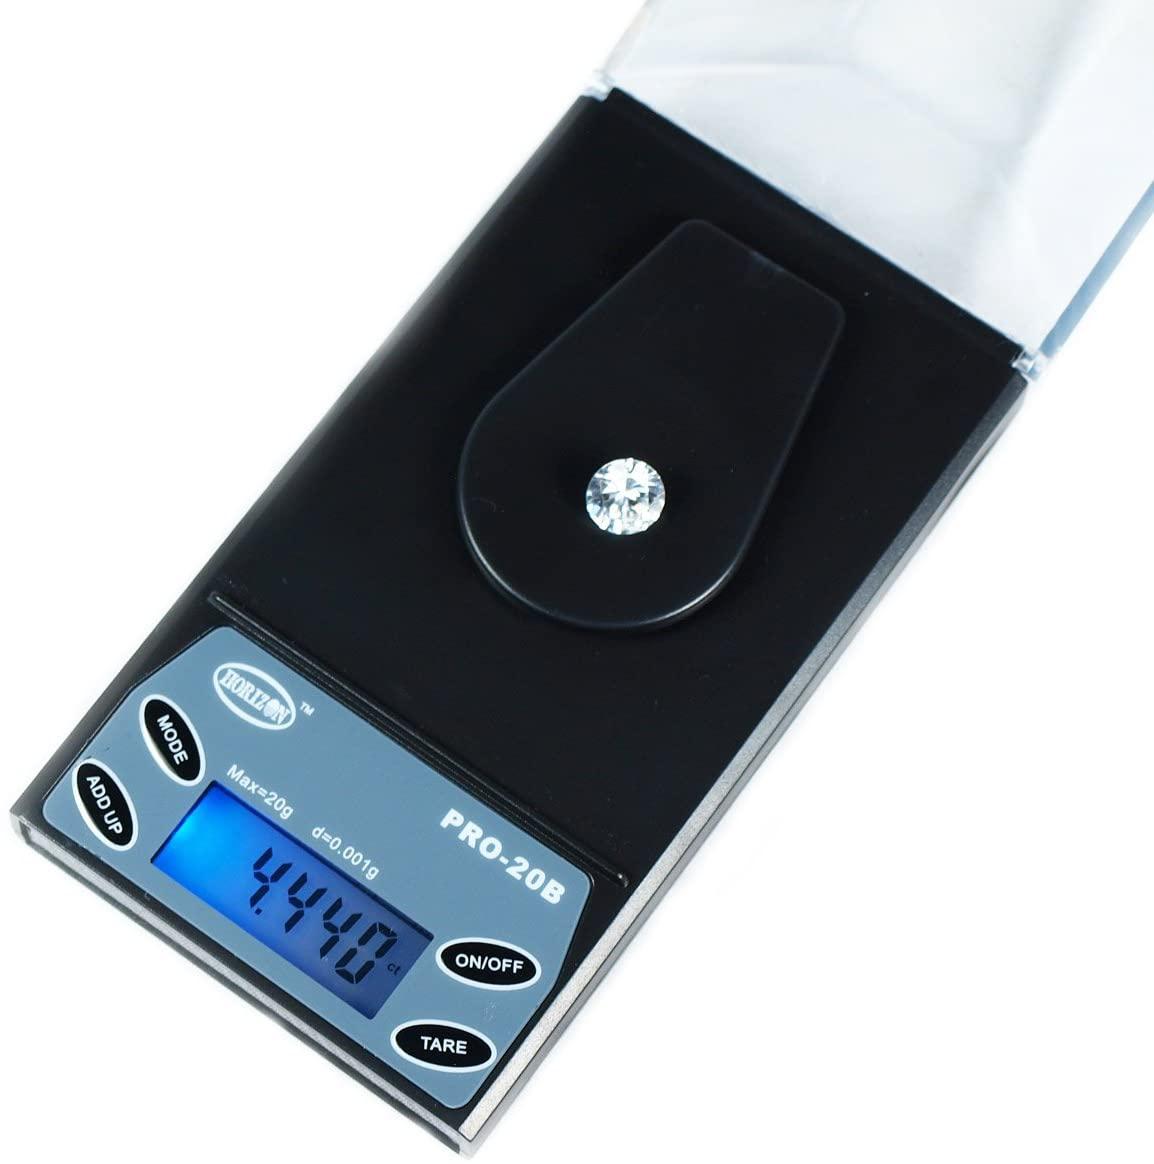 Horizon PRO-20B Digital Jewelry Scale, 20g by 0.001g